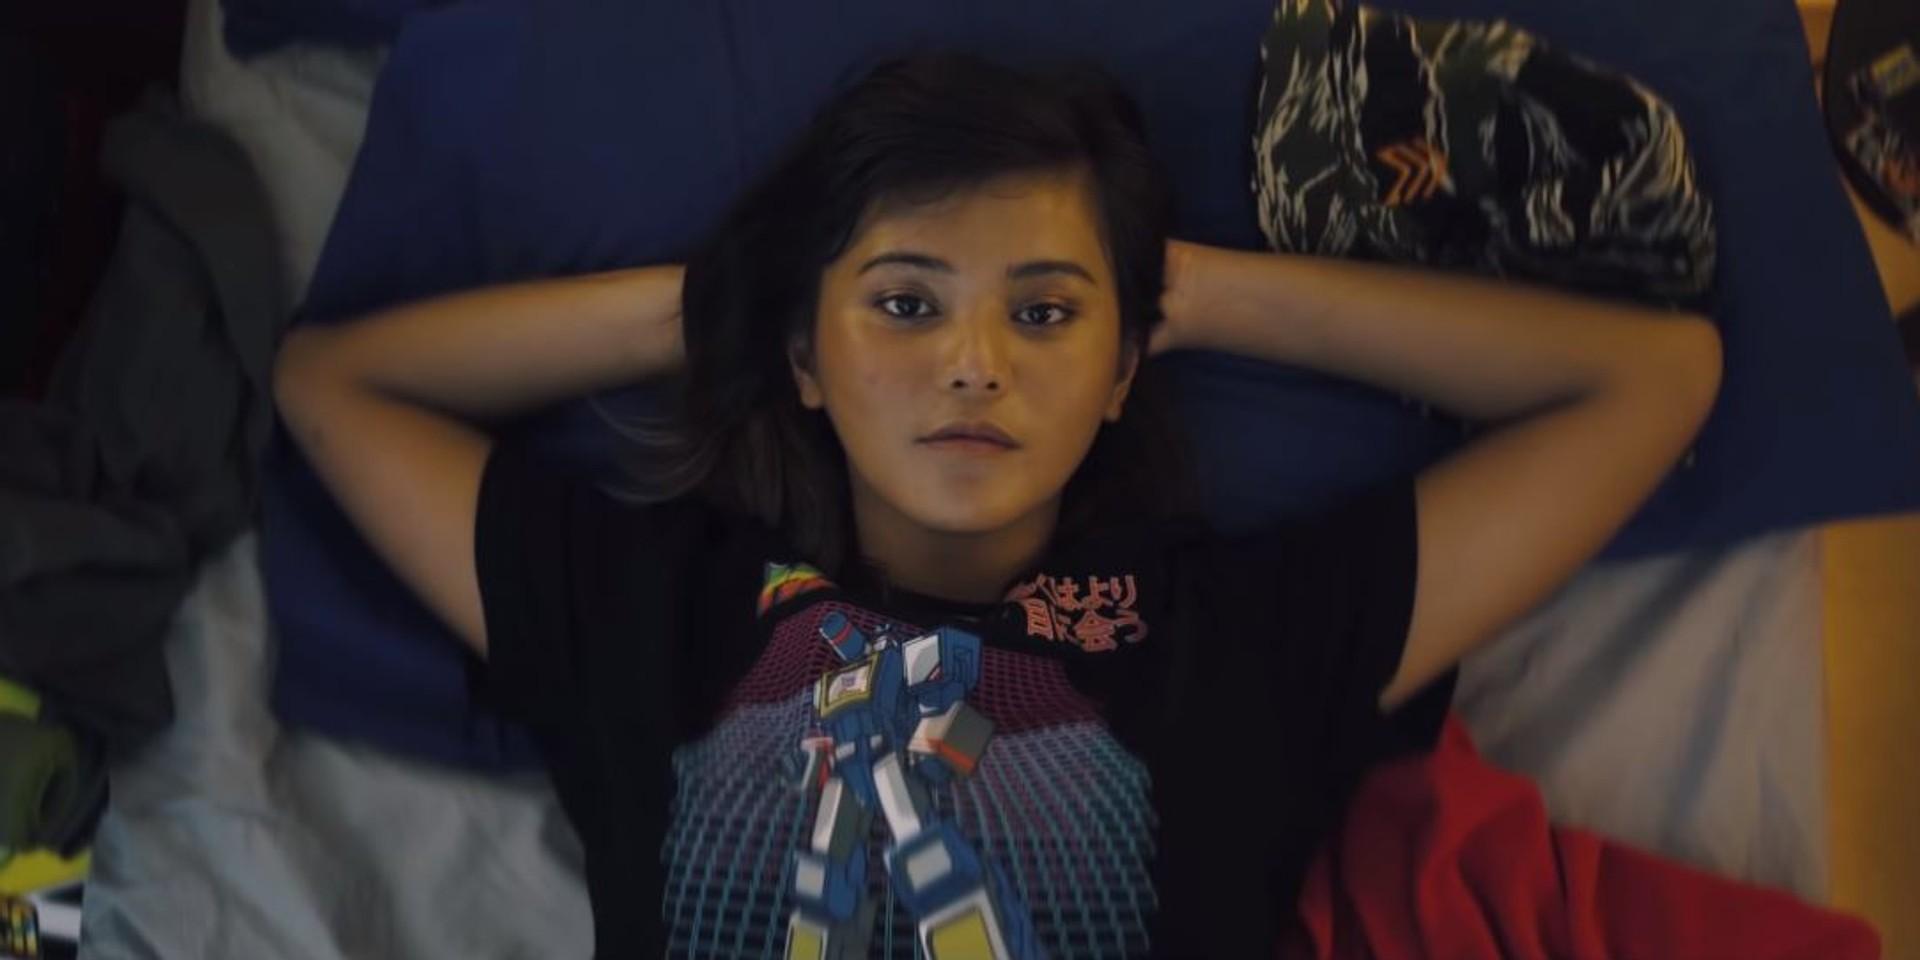 Peaceful Gemini drops 'Mind, Body, and Soul' music video – watch